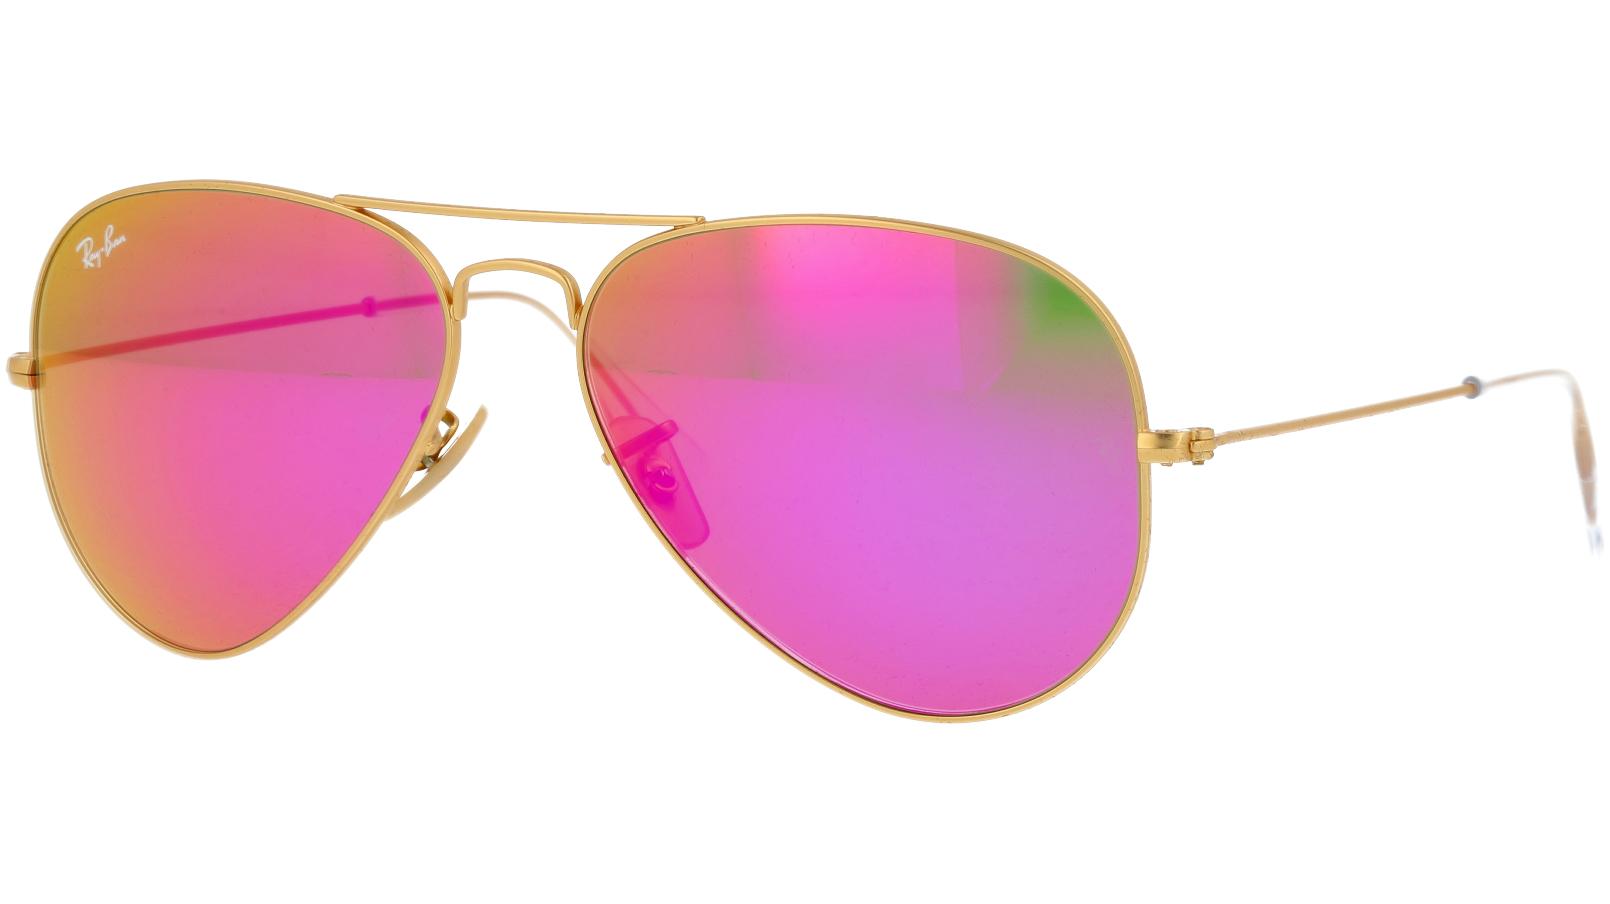 Ray-Ban RB3025 112/4T 58 Matte Arista Sunglasses